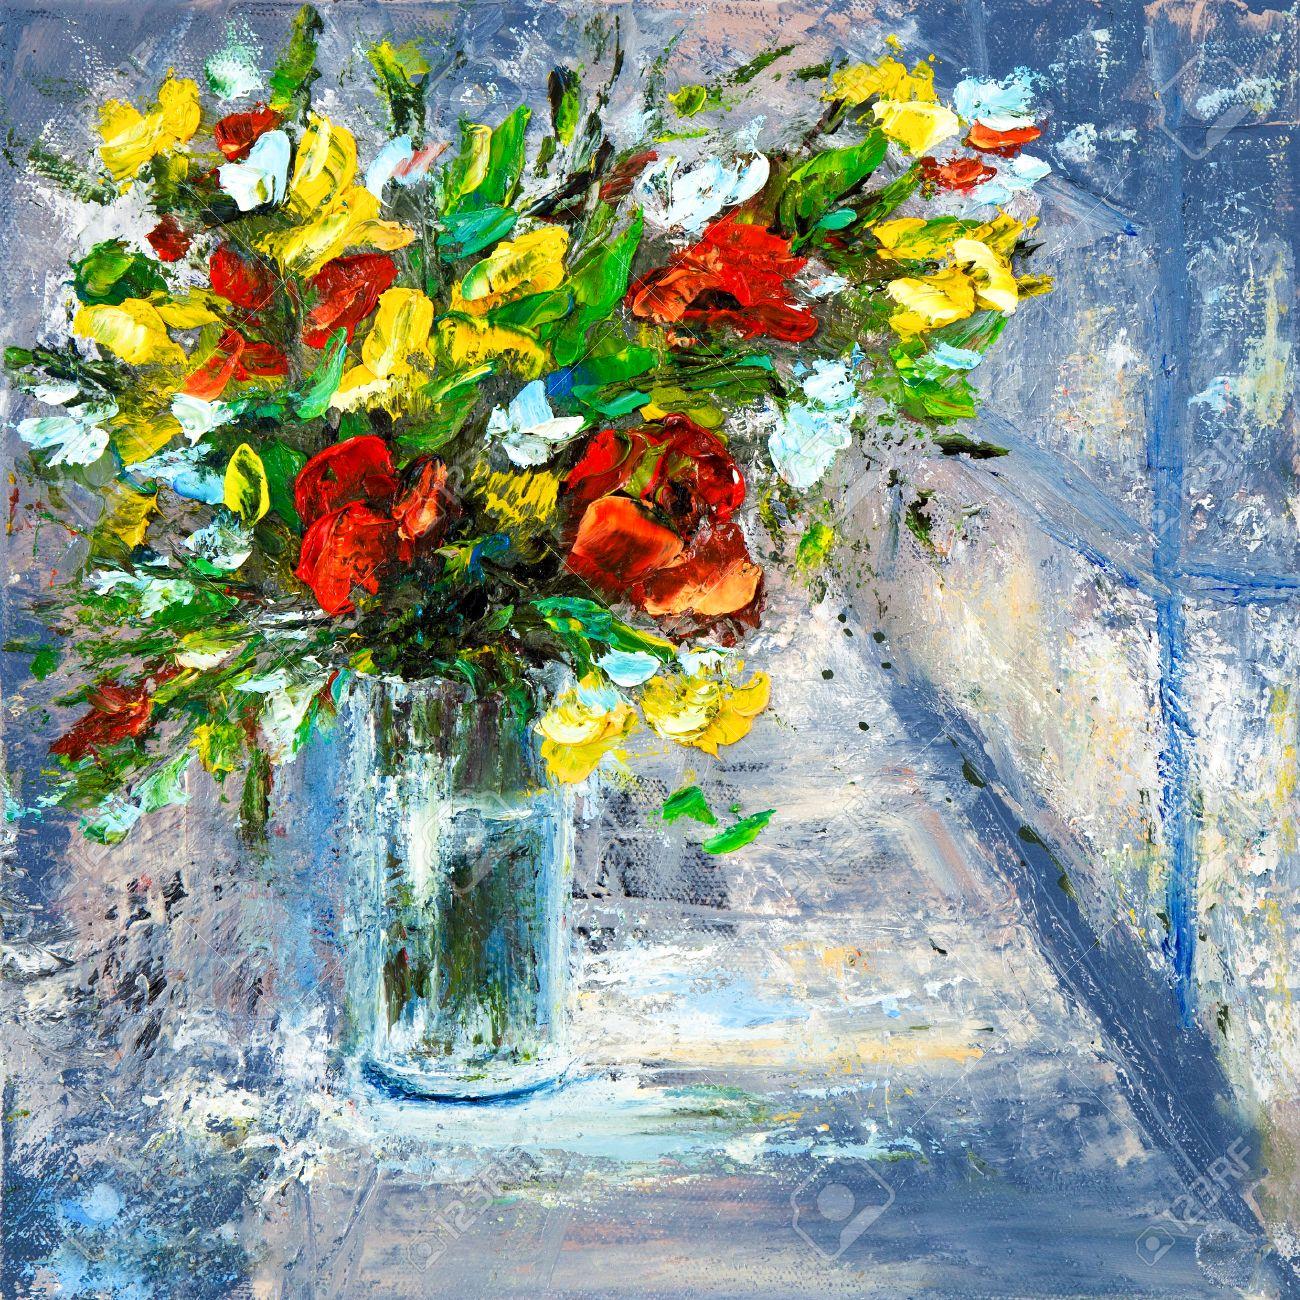 Original Oil Painting Of Beautiful Vase Or Bowl Of Fresh Flowers